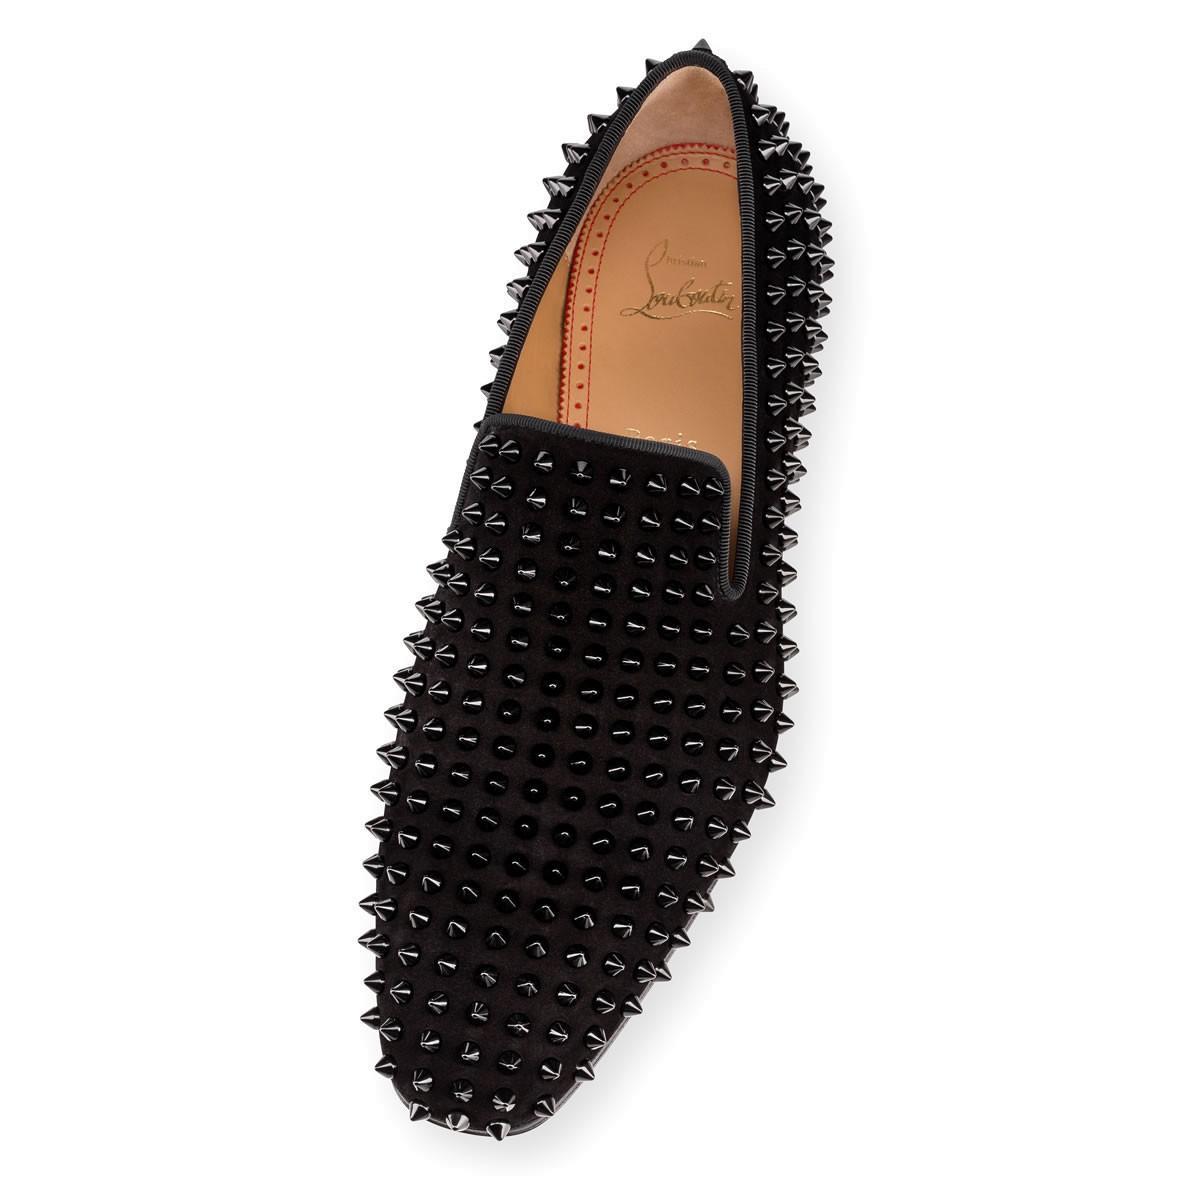 f676162a84c1 Christian Louboutin Spiked Dandelion Venetian Loafers - Black